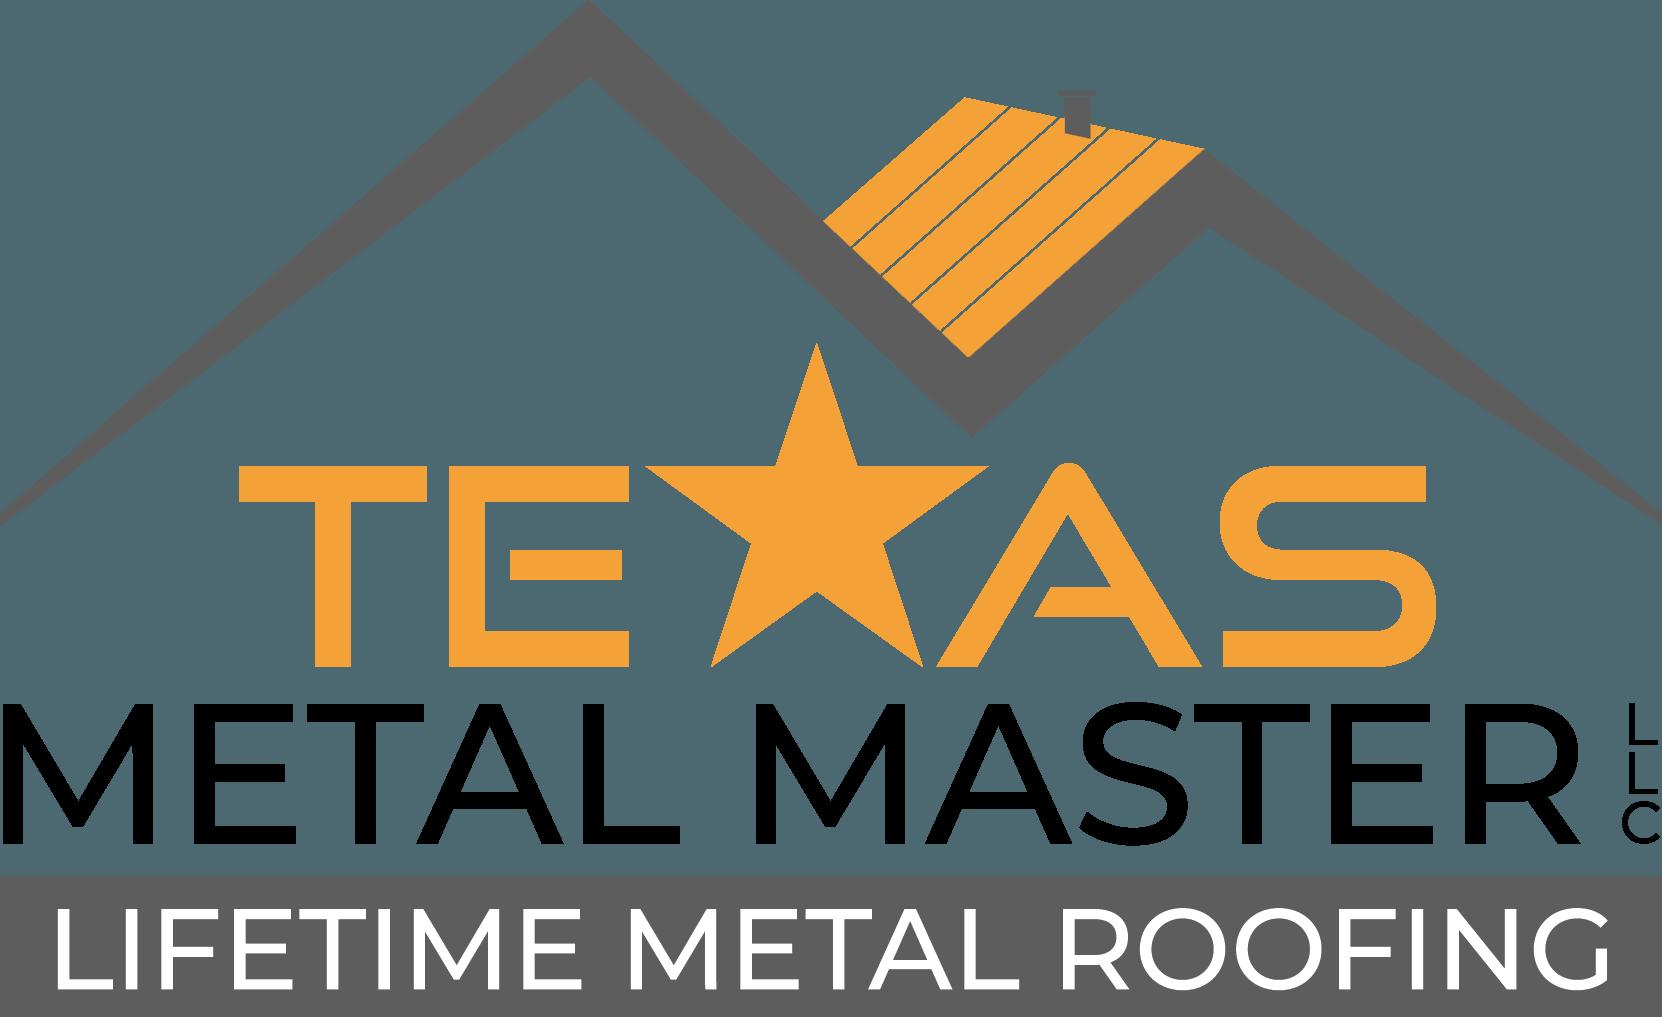 Texas Metal Master